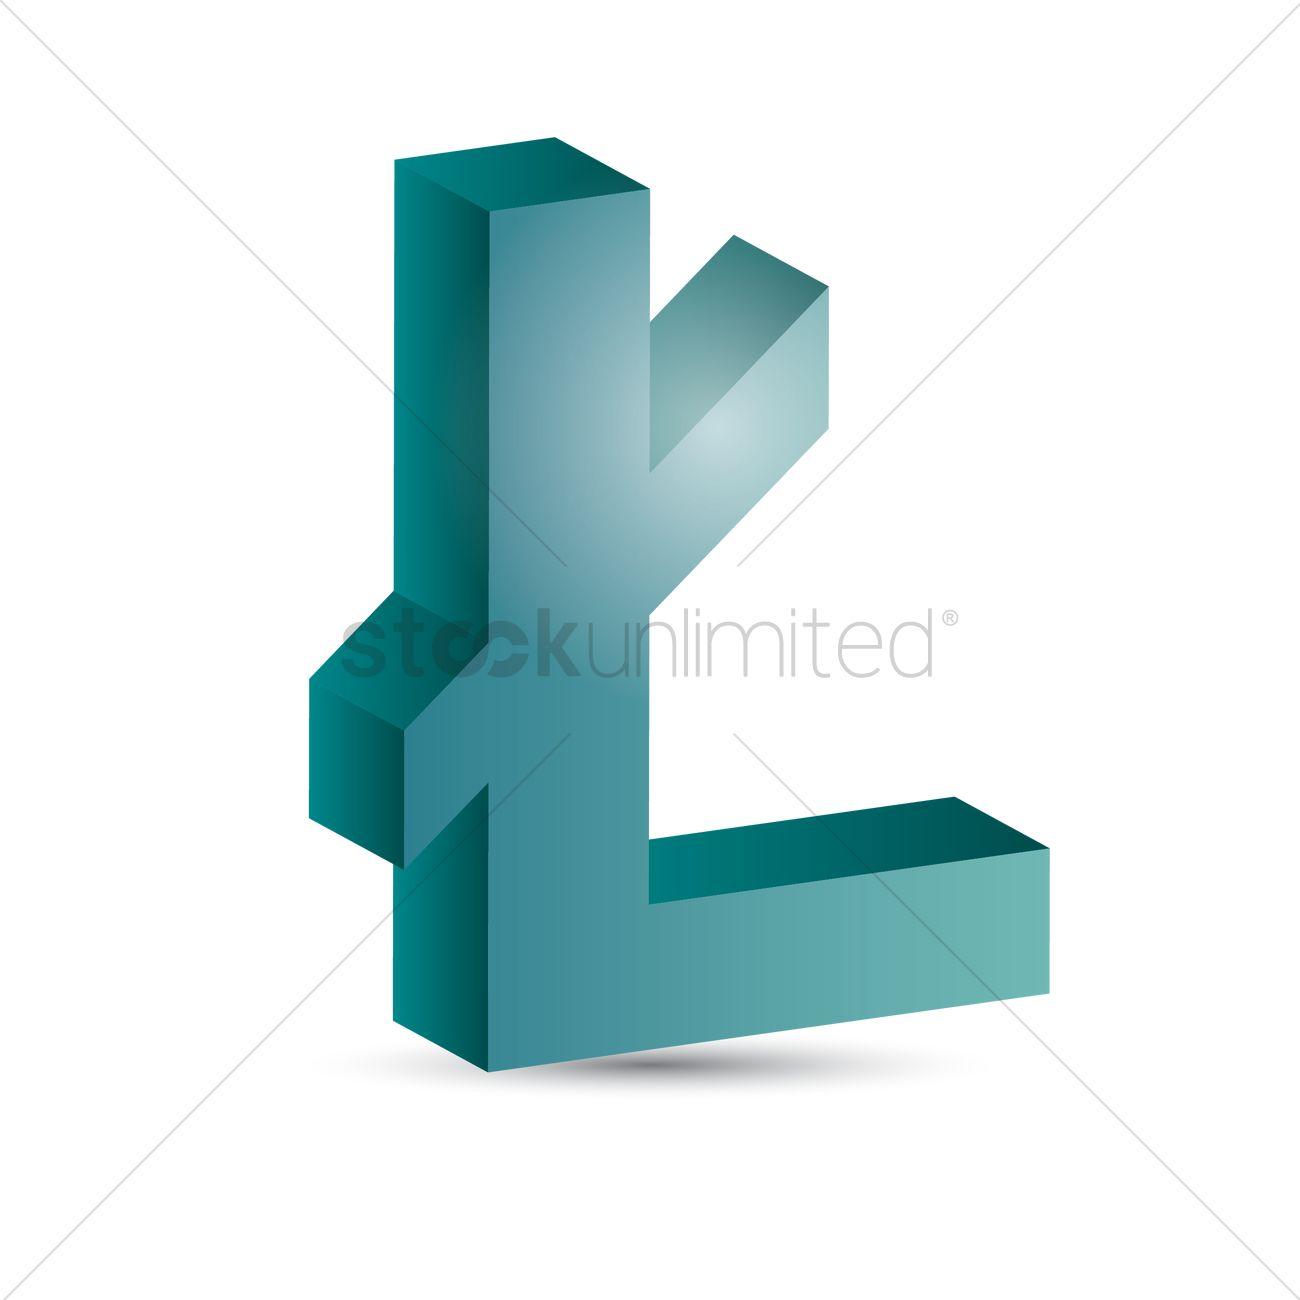 Turkey lira symbol vector image 1866855 stockunlimited turkey lira symbol vector graphic buycottarizona